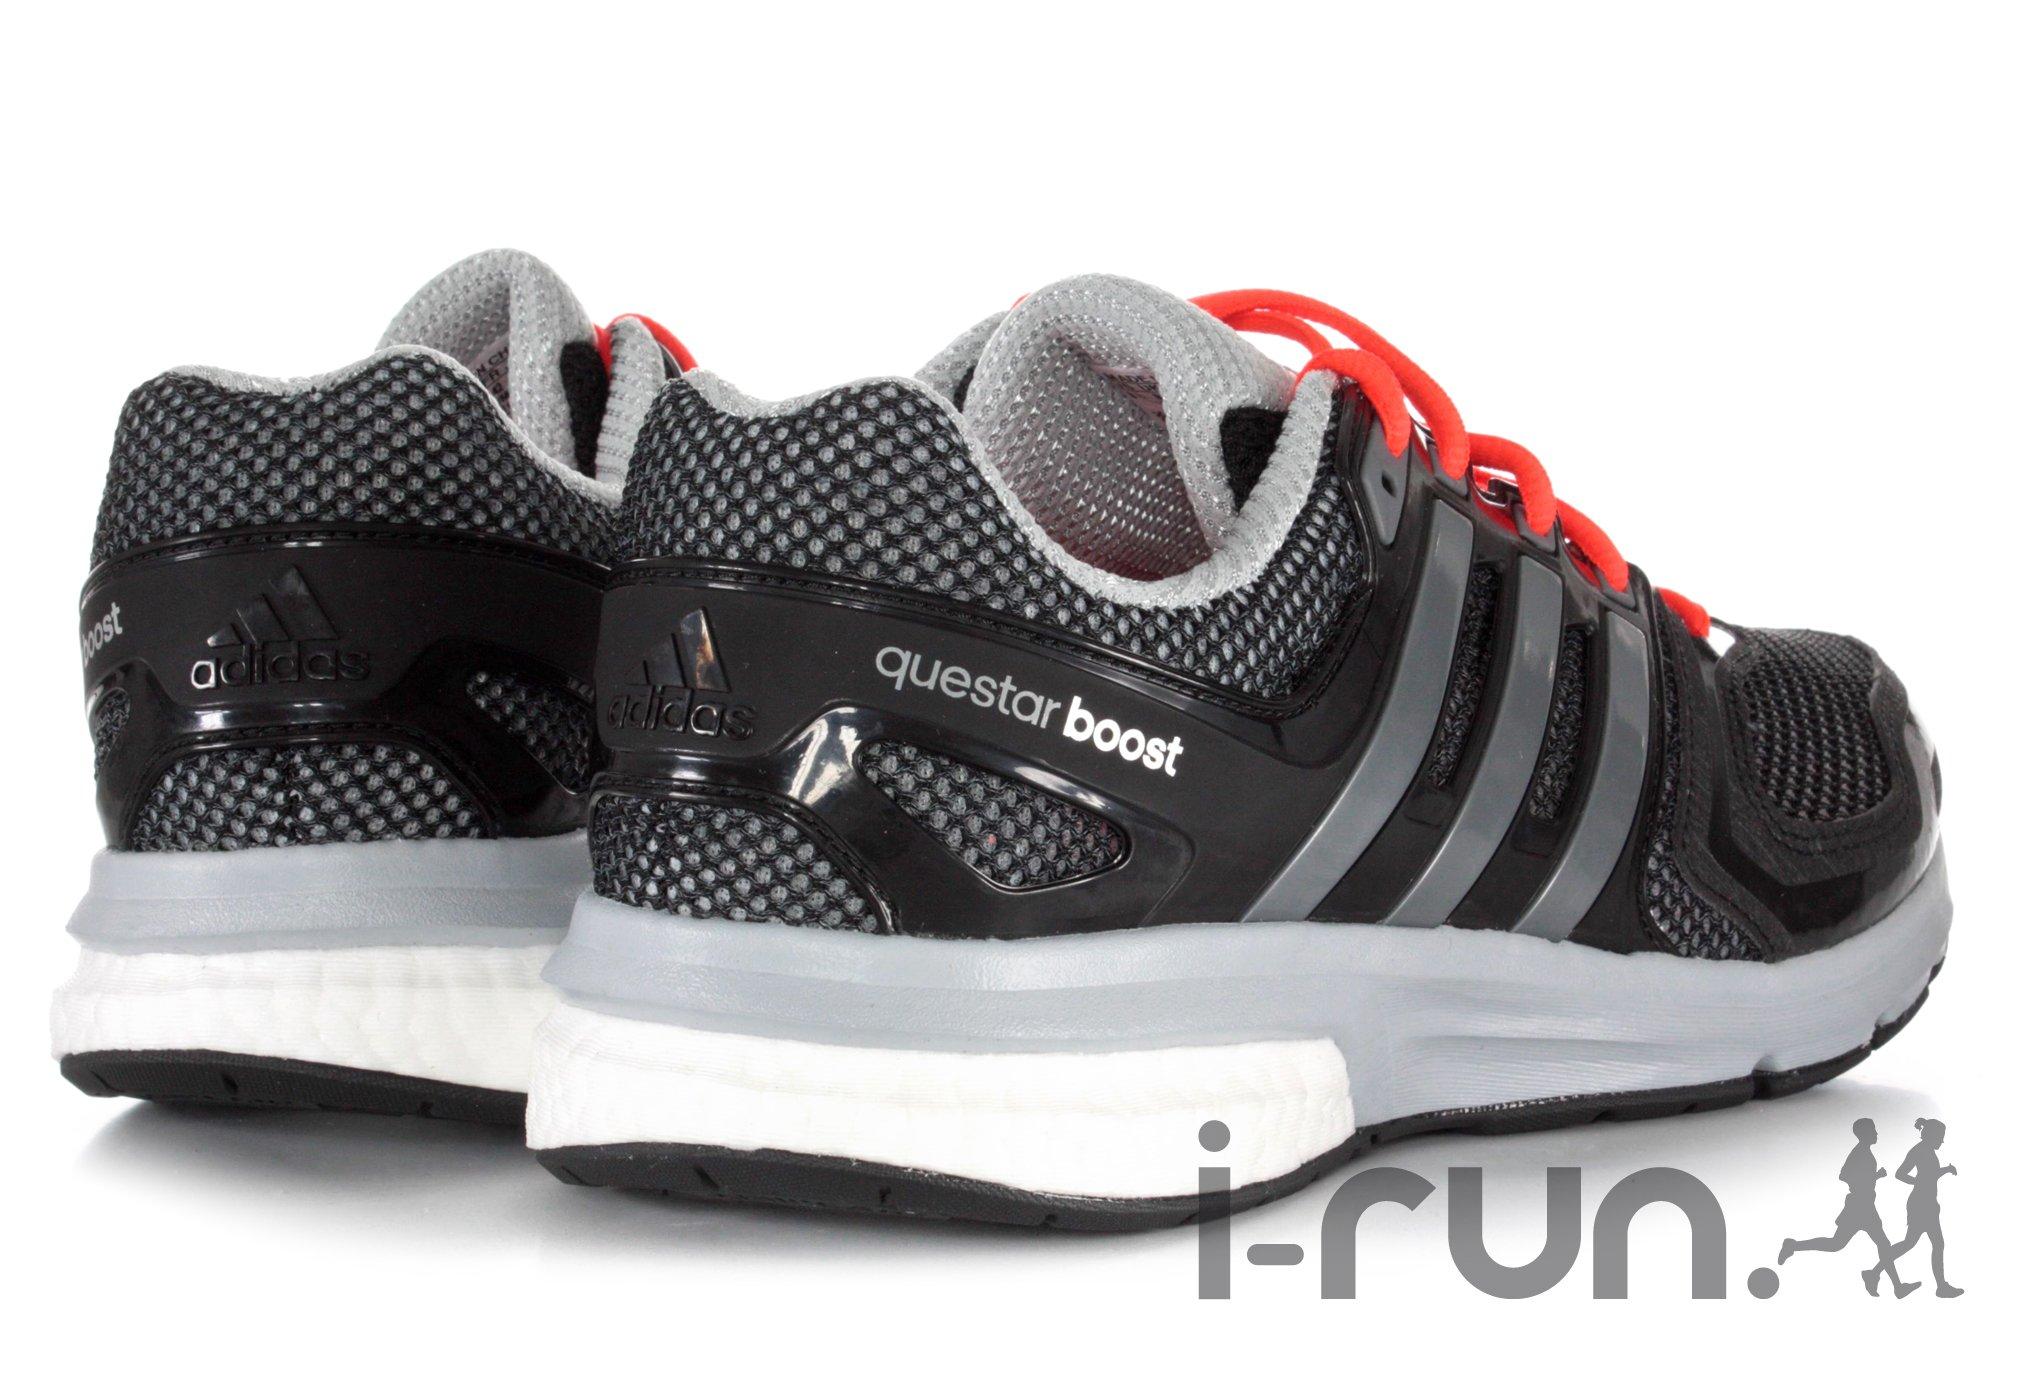 on sale f76a8 0e274 adidas questar boost tf m